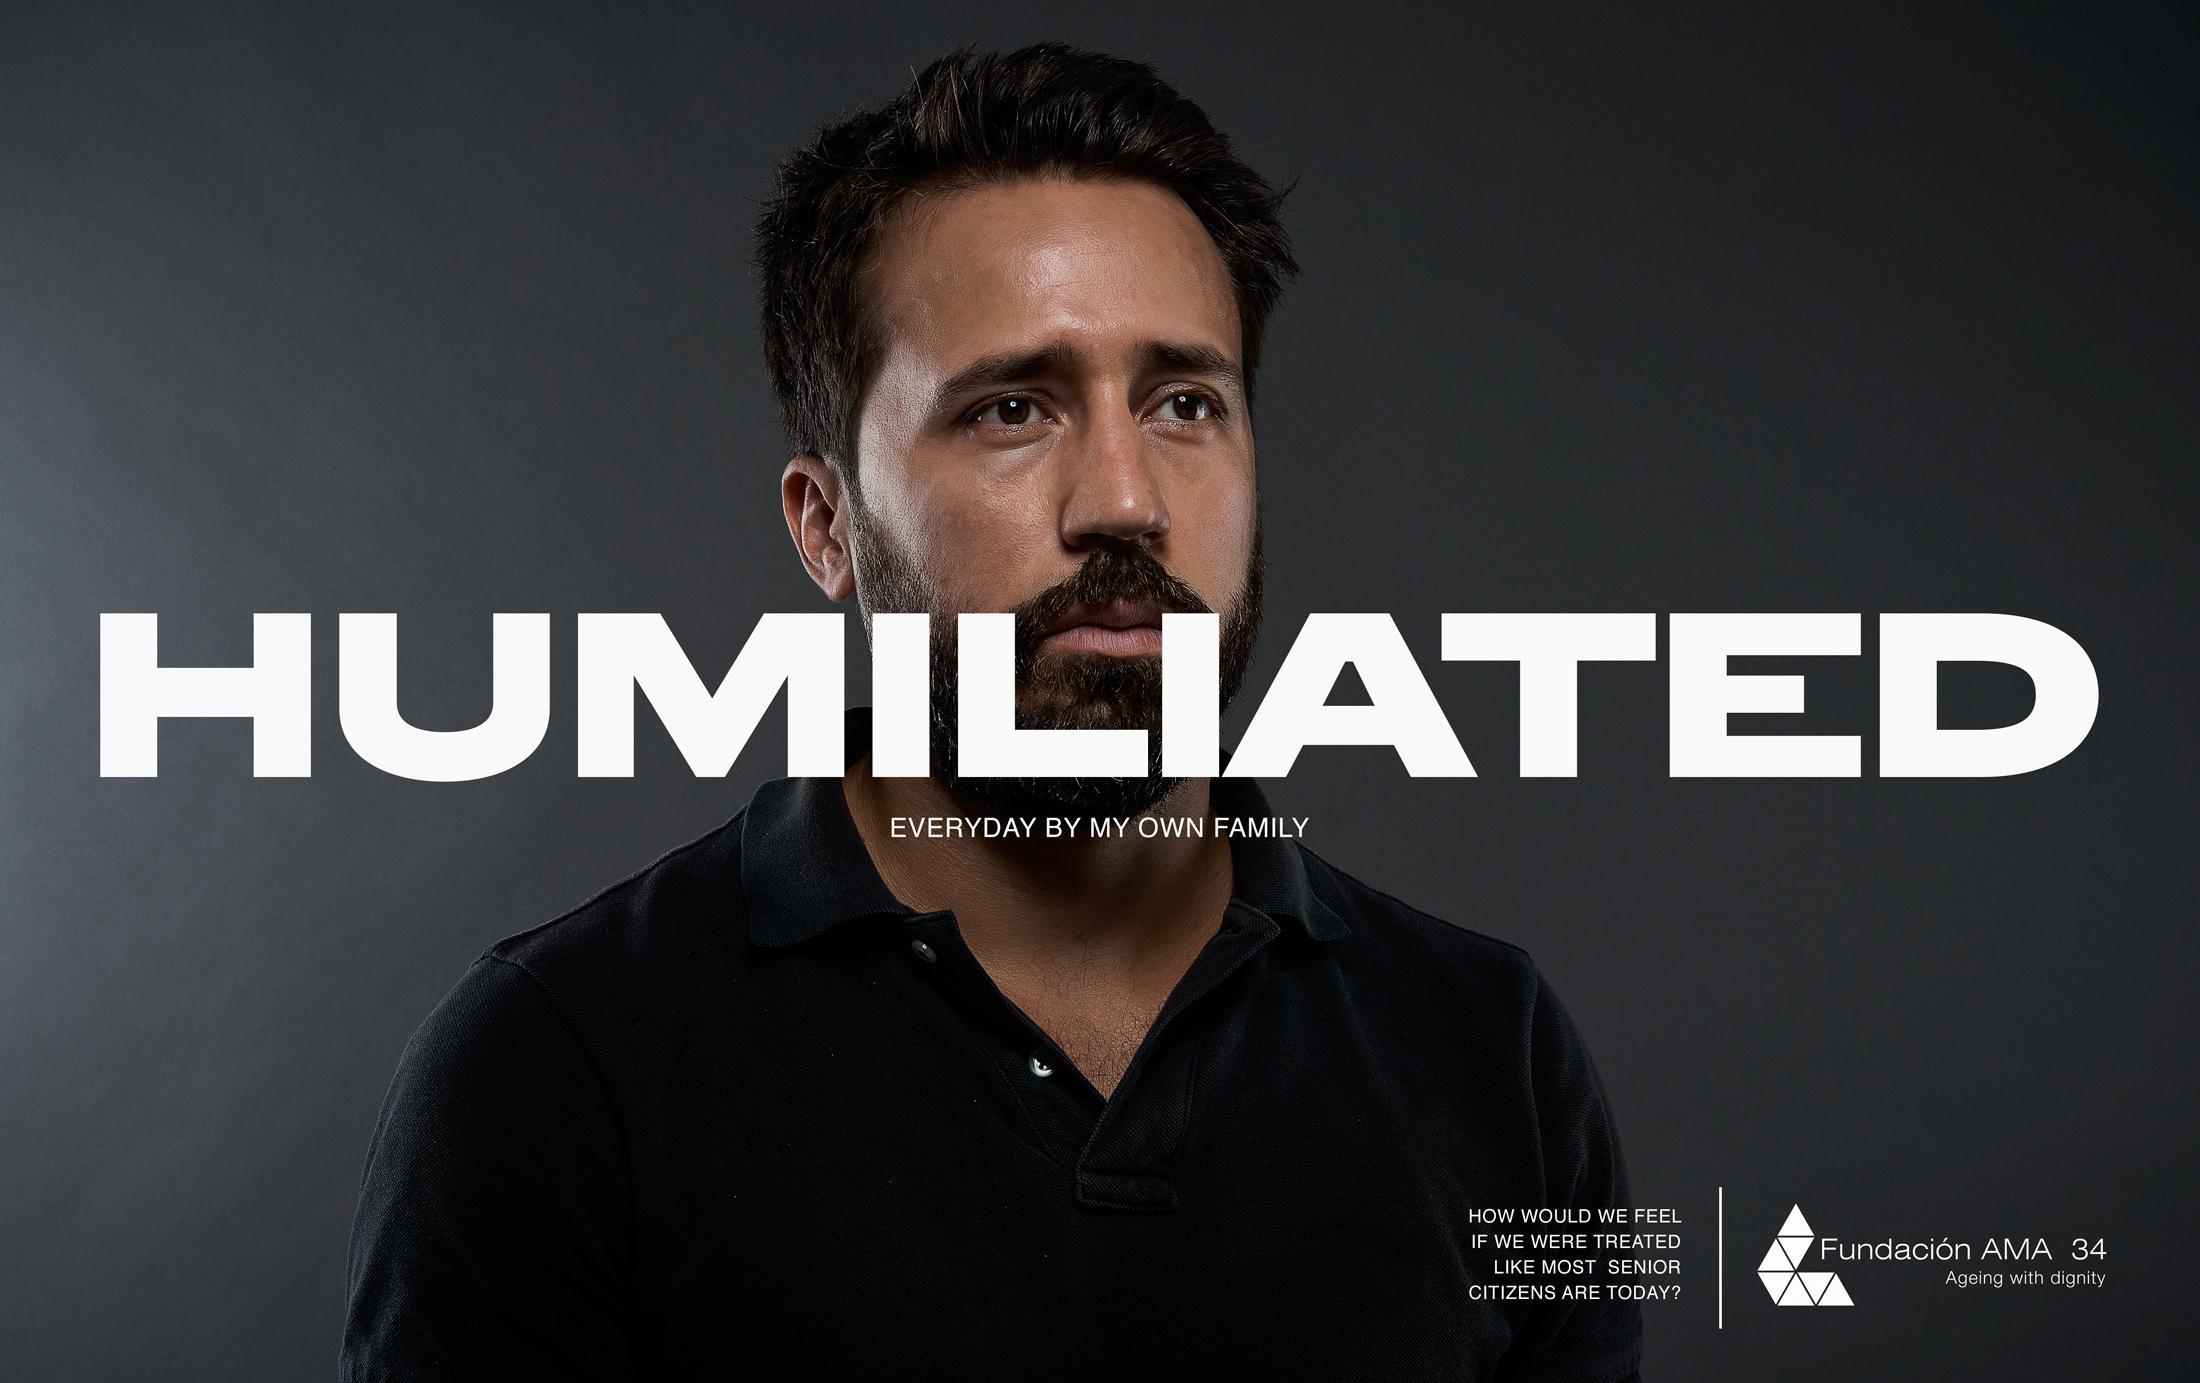 AMA 34 Foundation Print Ad - Humiliated